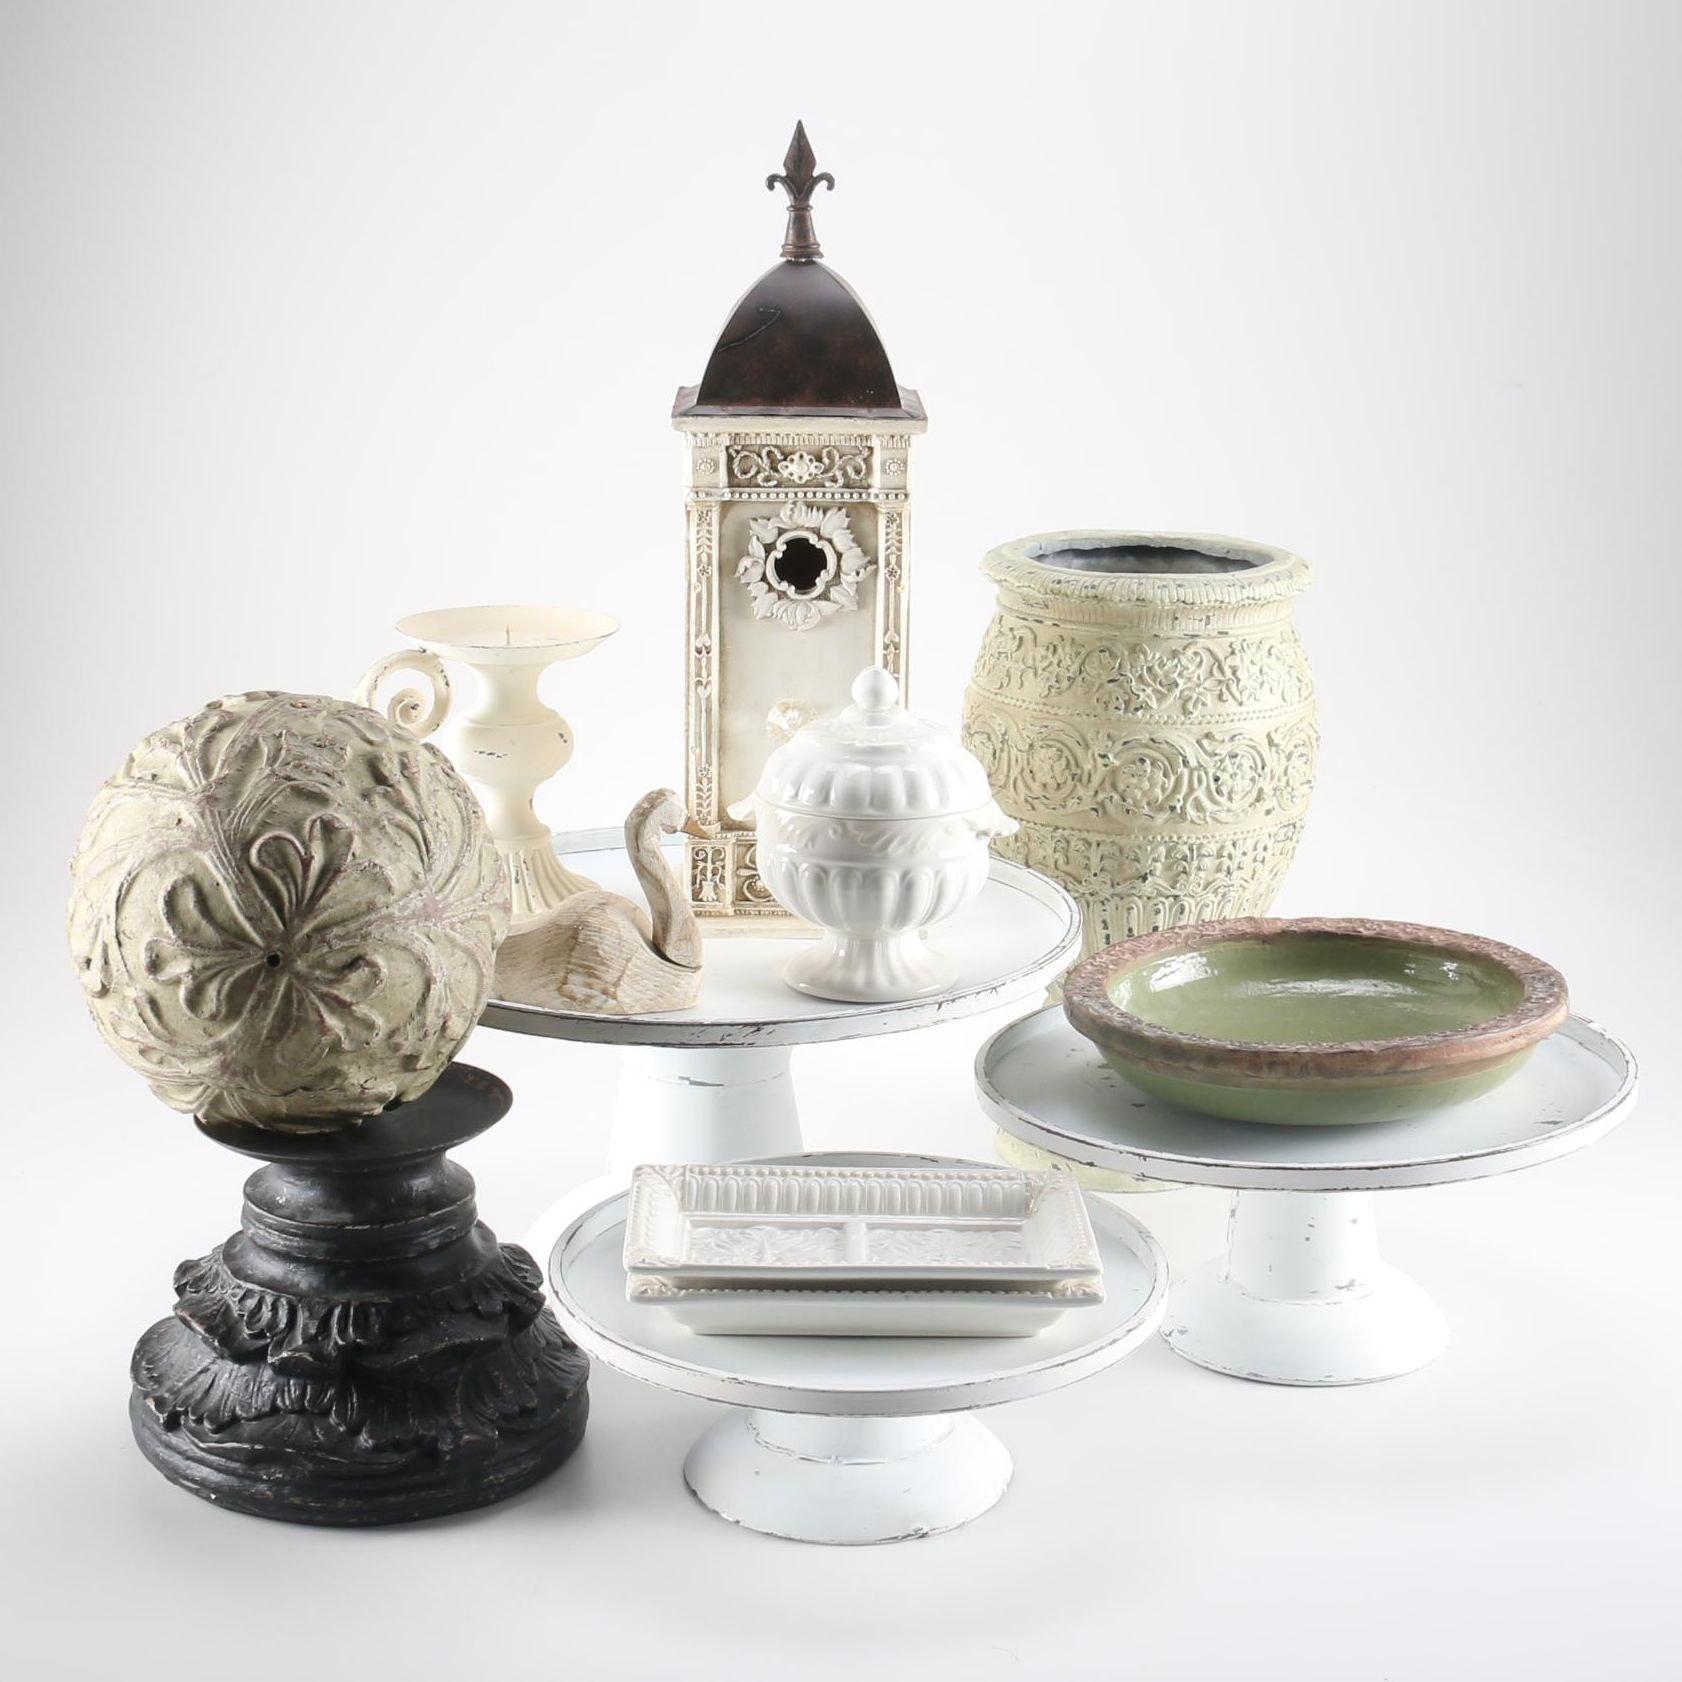 Rustic Tabletop and Ceramic Decor Featuring Lenox